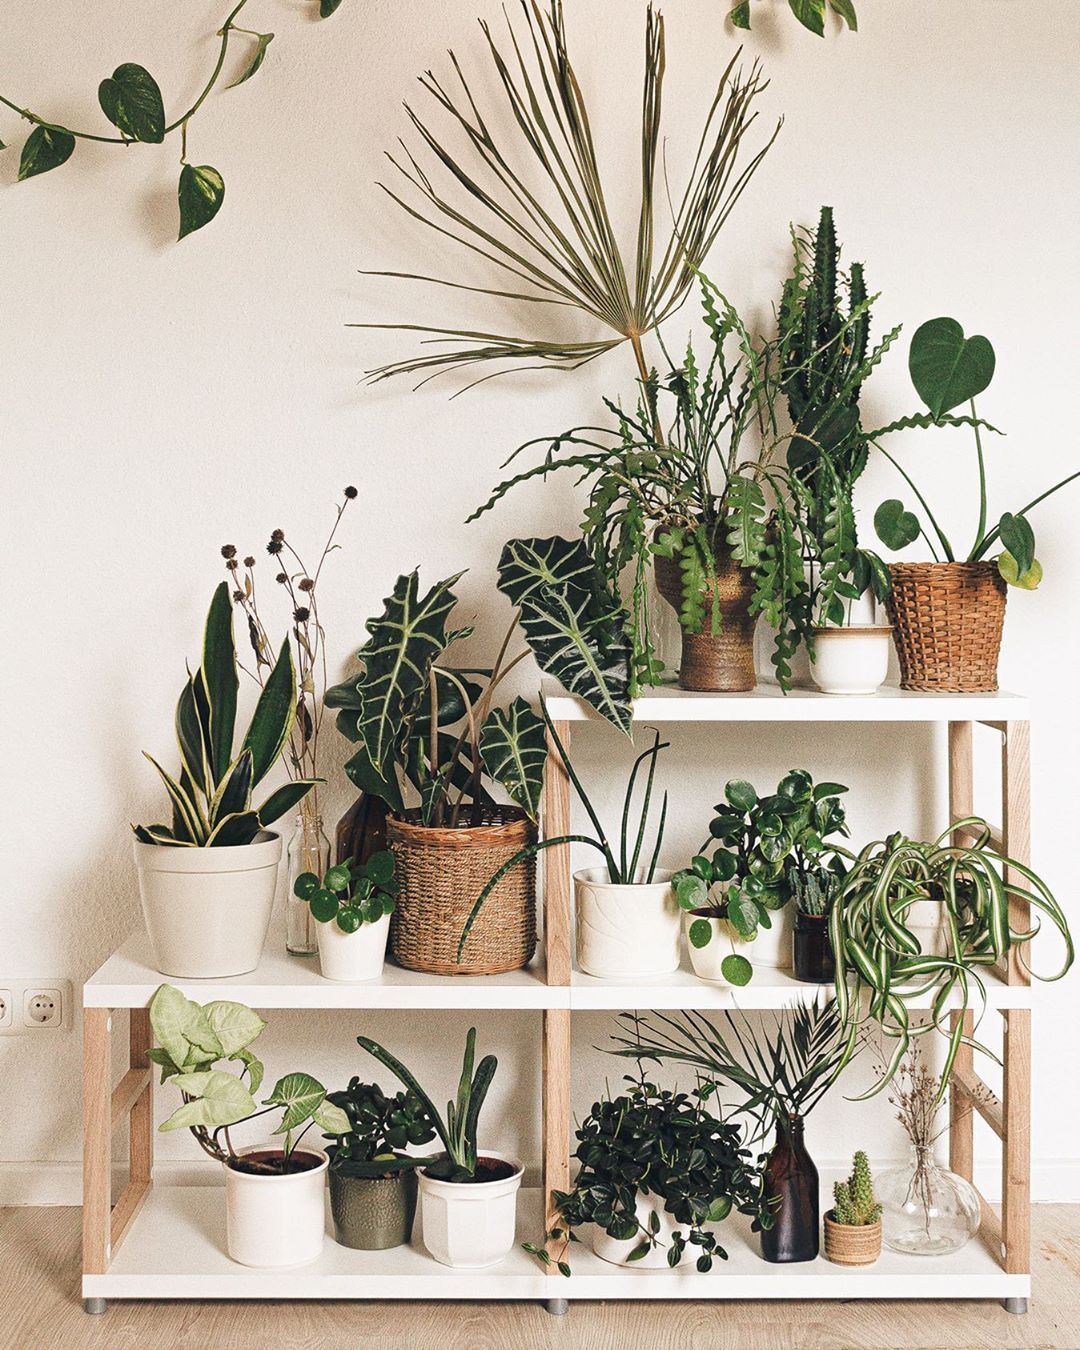 MAXX Pflanzenregal in 7  Interior plants, Plants, House plants